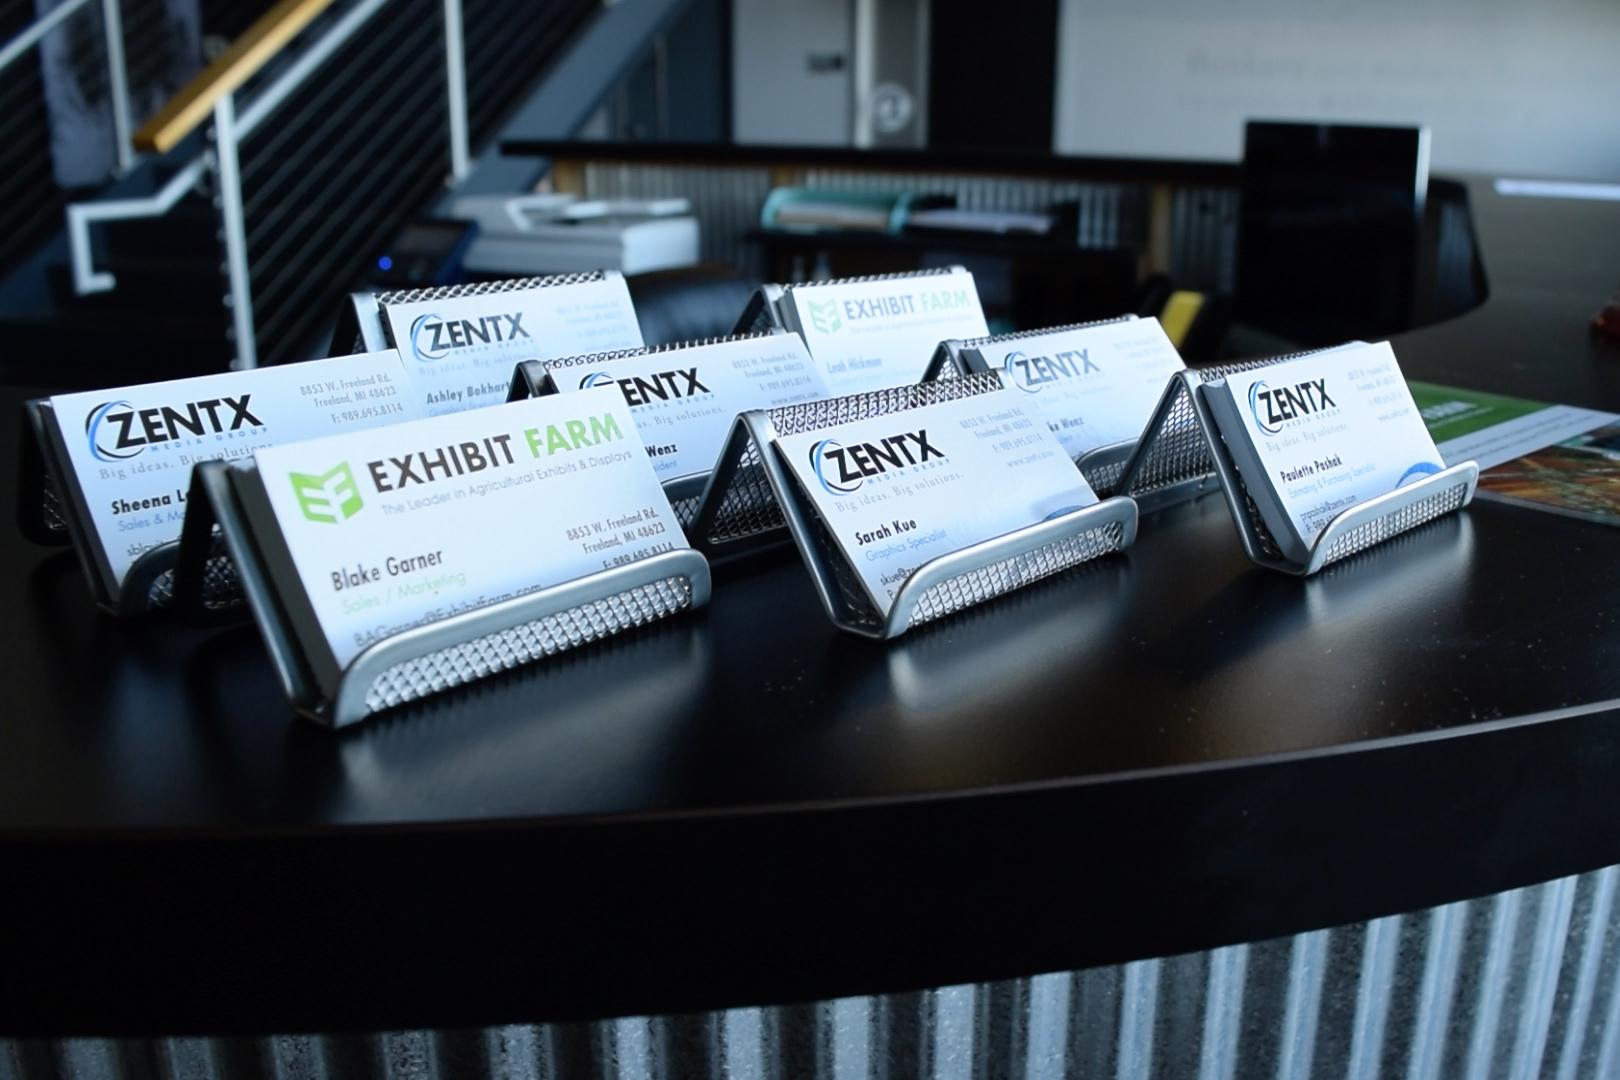 Business cards on ZENTX's front desk